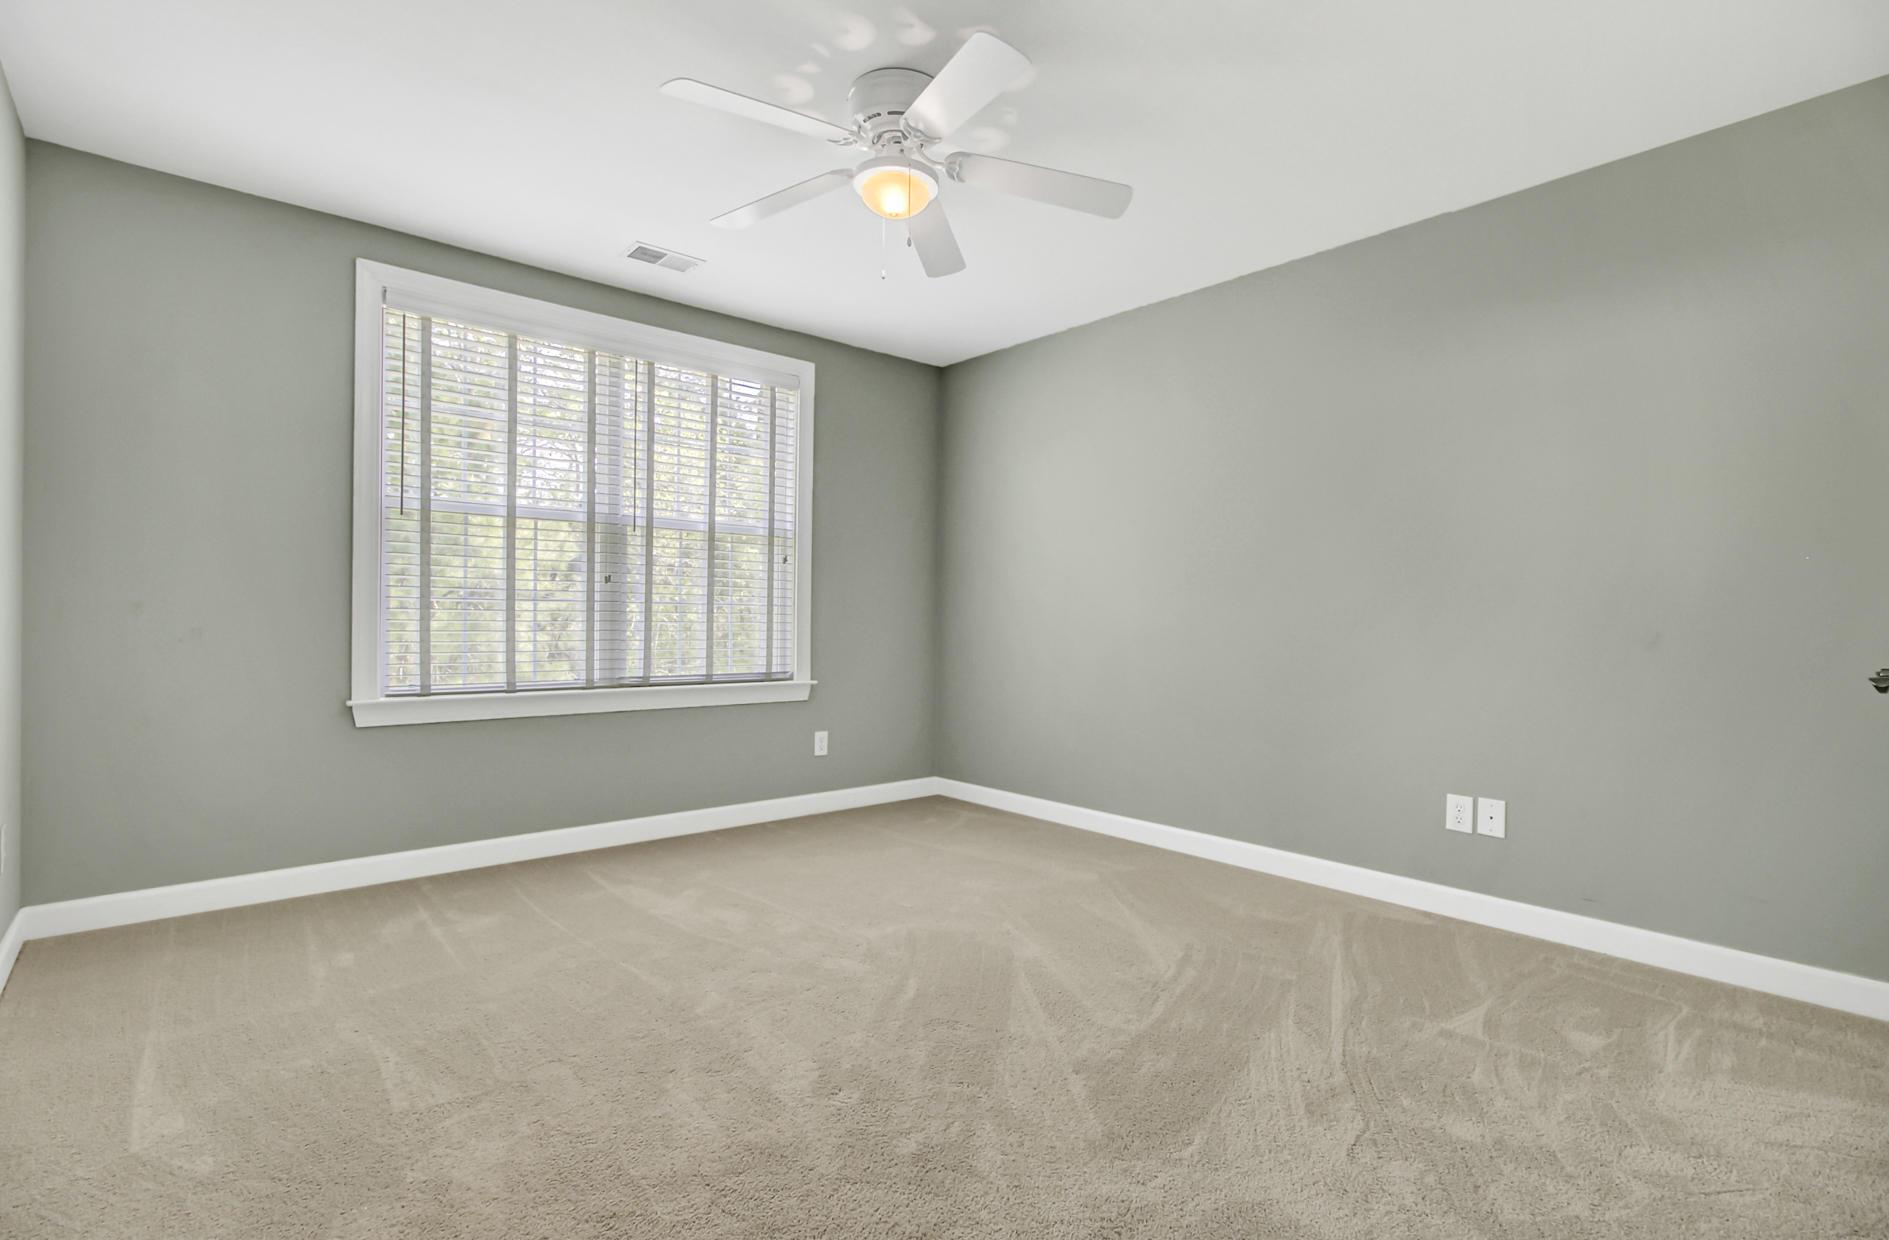 Marsh Cove Homes For Sale - 2928 Riverwood, Mount Pleasant, SC - 10